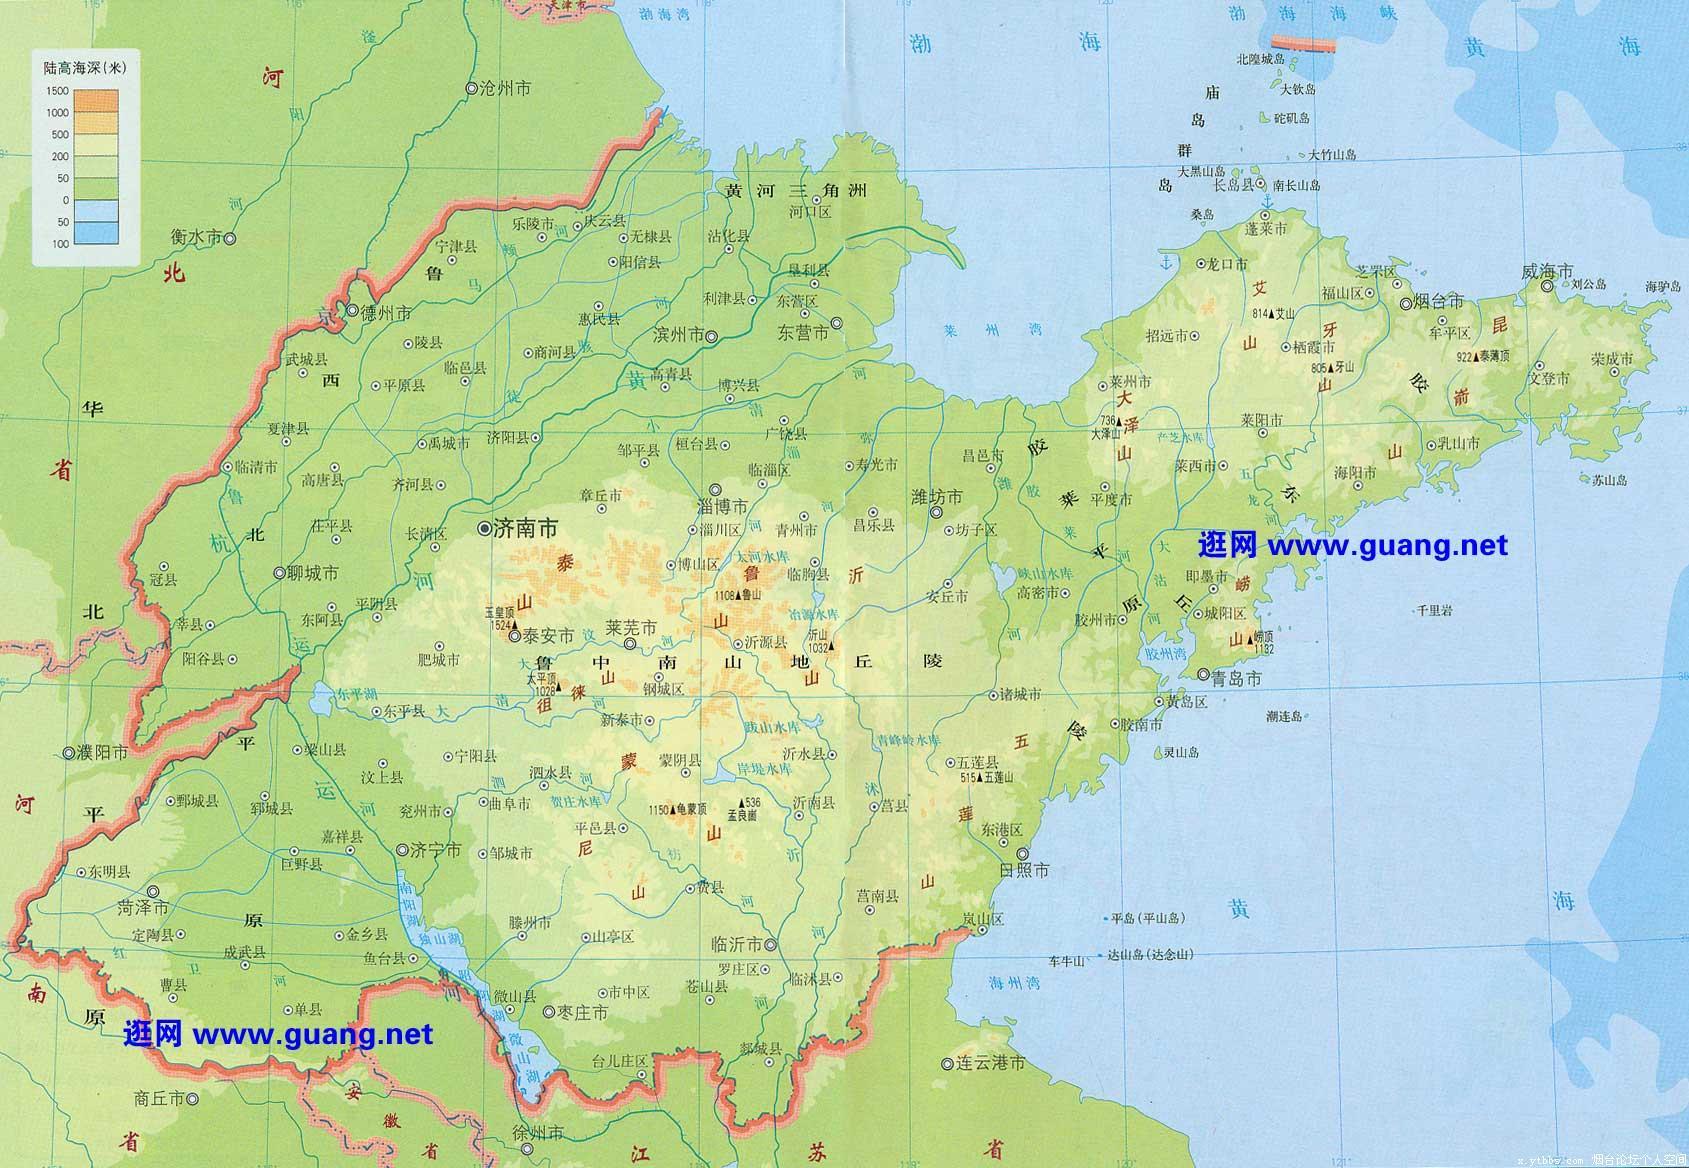 shandong1 - 山东地图